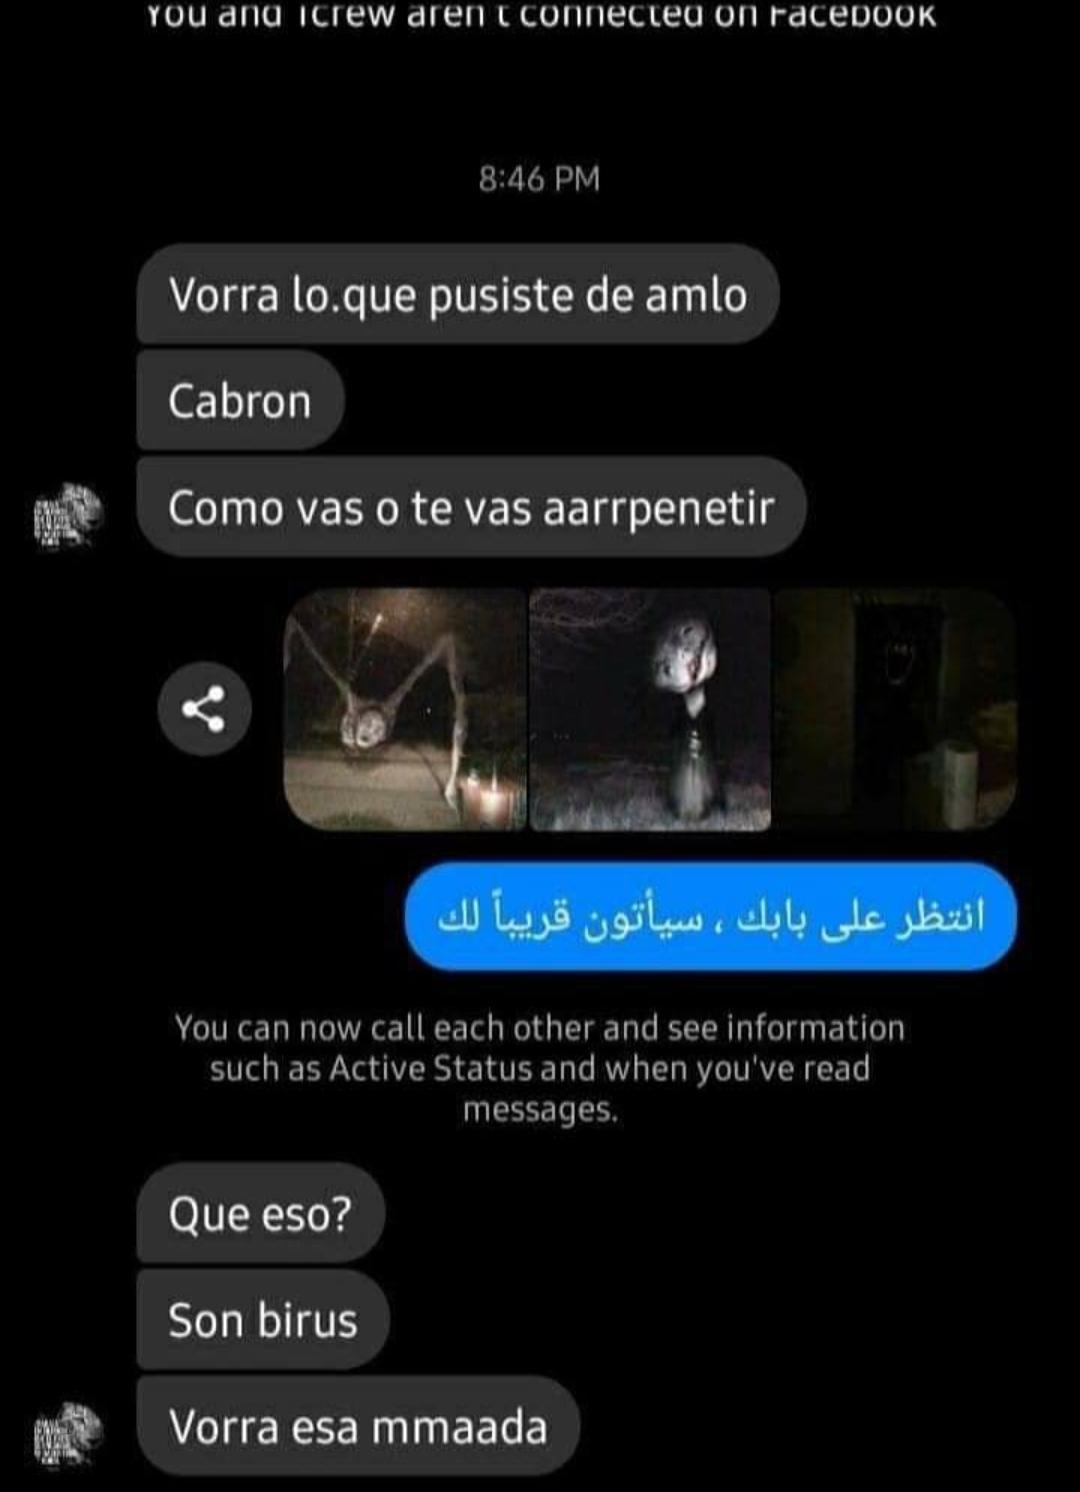 Cabron - meme